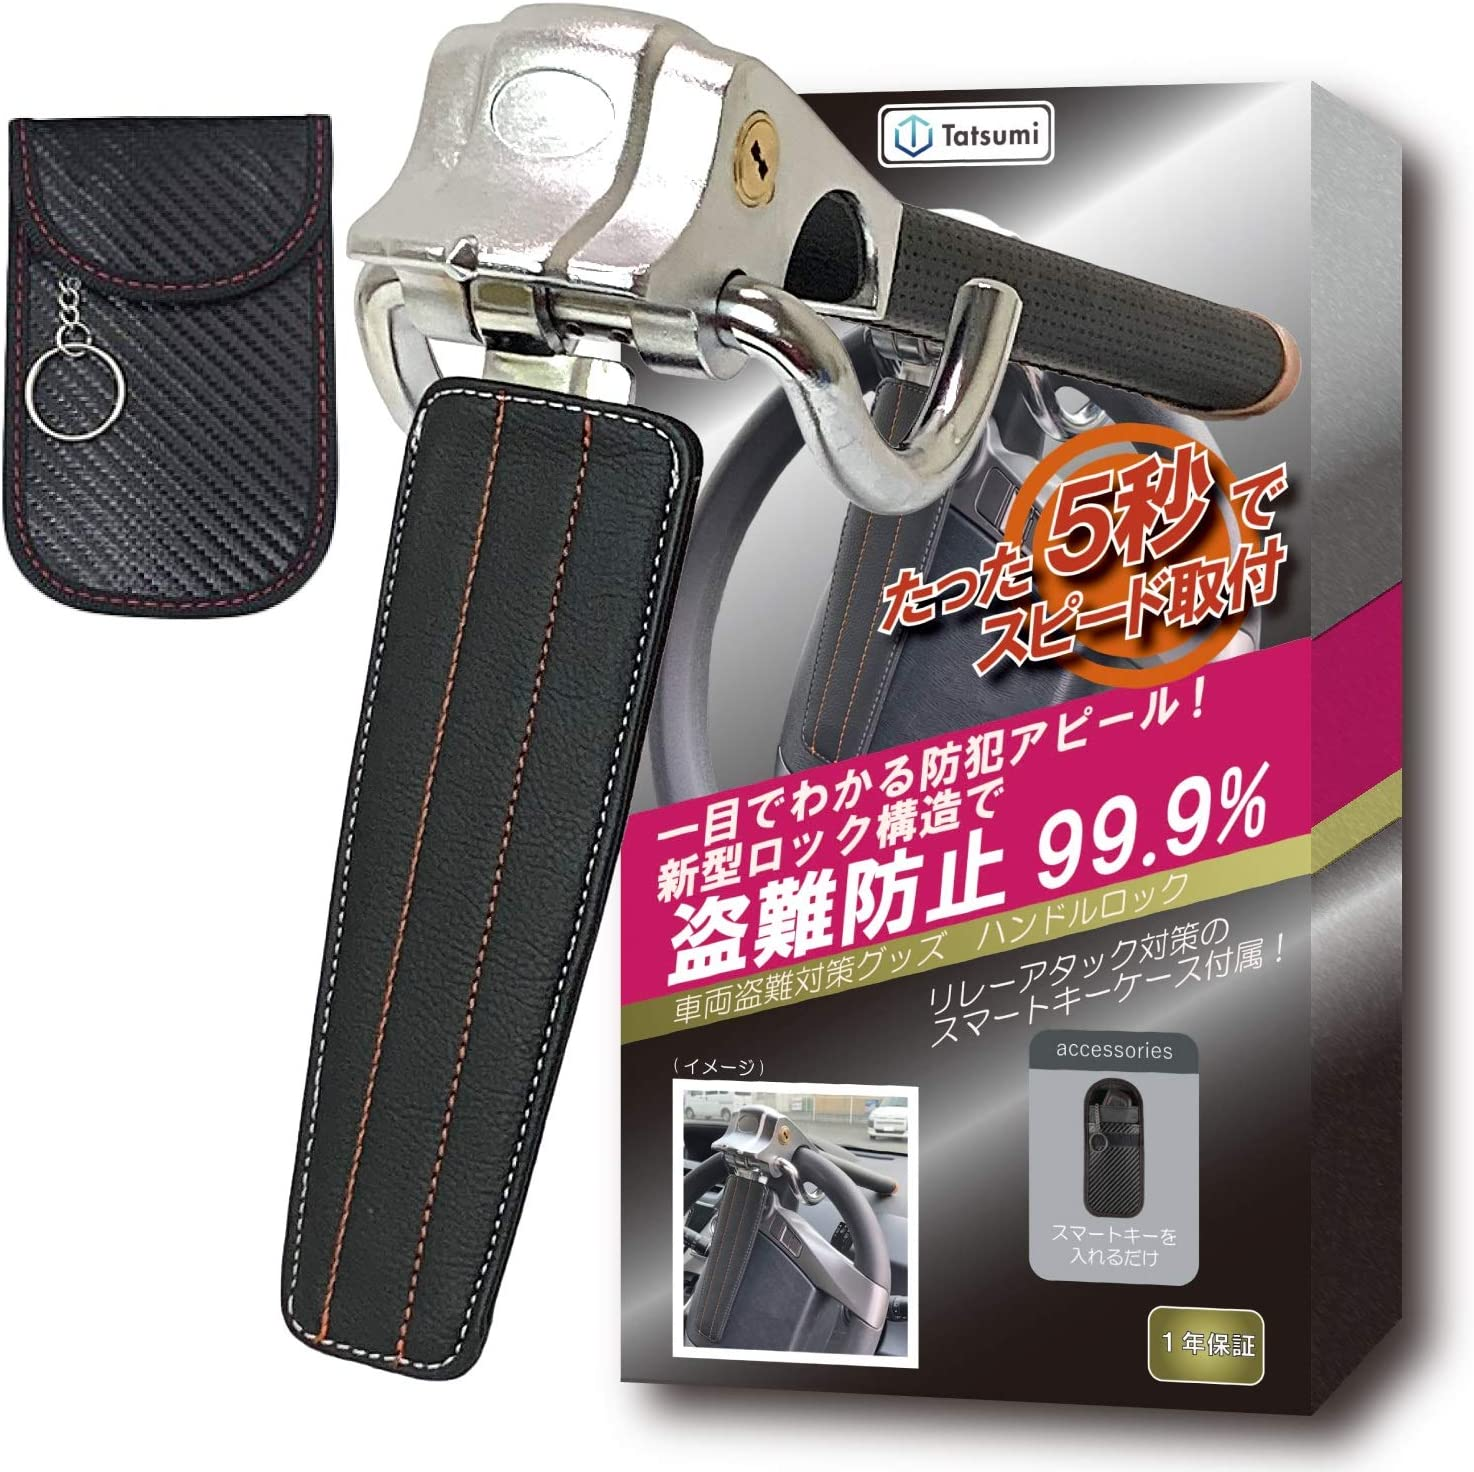 [Tatsumi]ハンドルロック ステアリング 車両盗難防止 リレーアタック対策グッズ電波遮断ポーチ